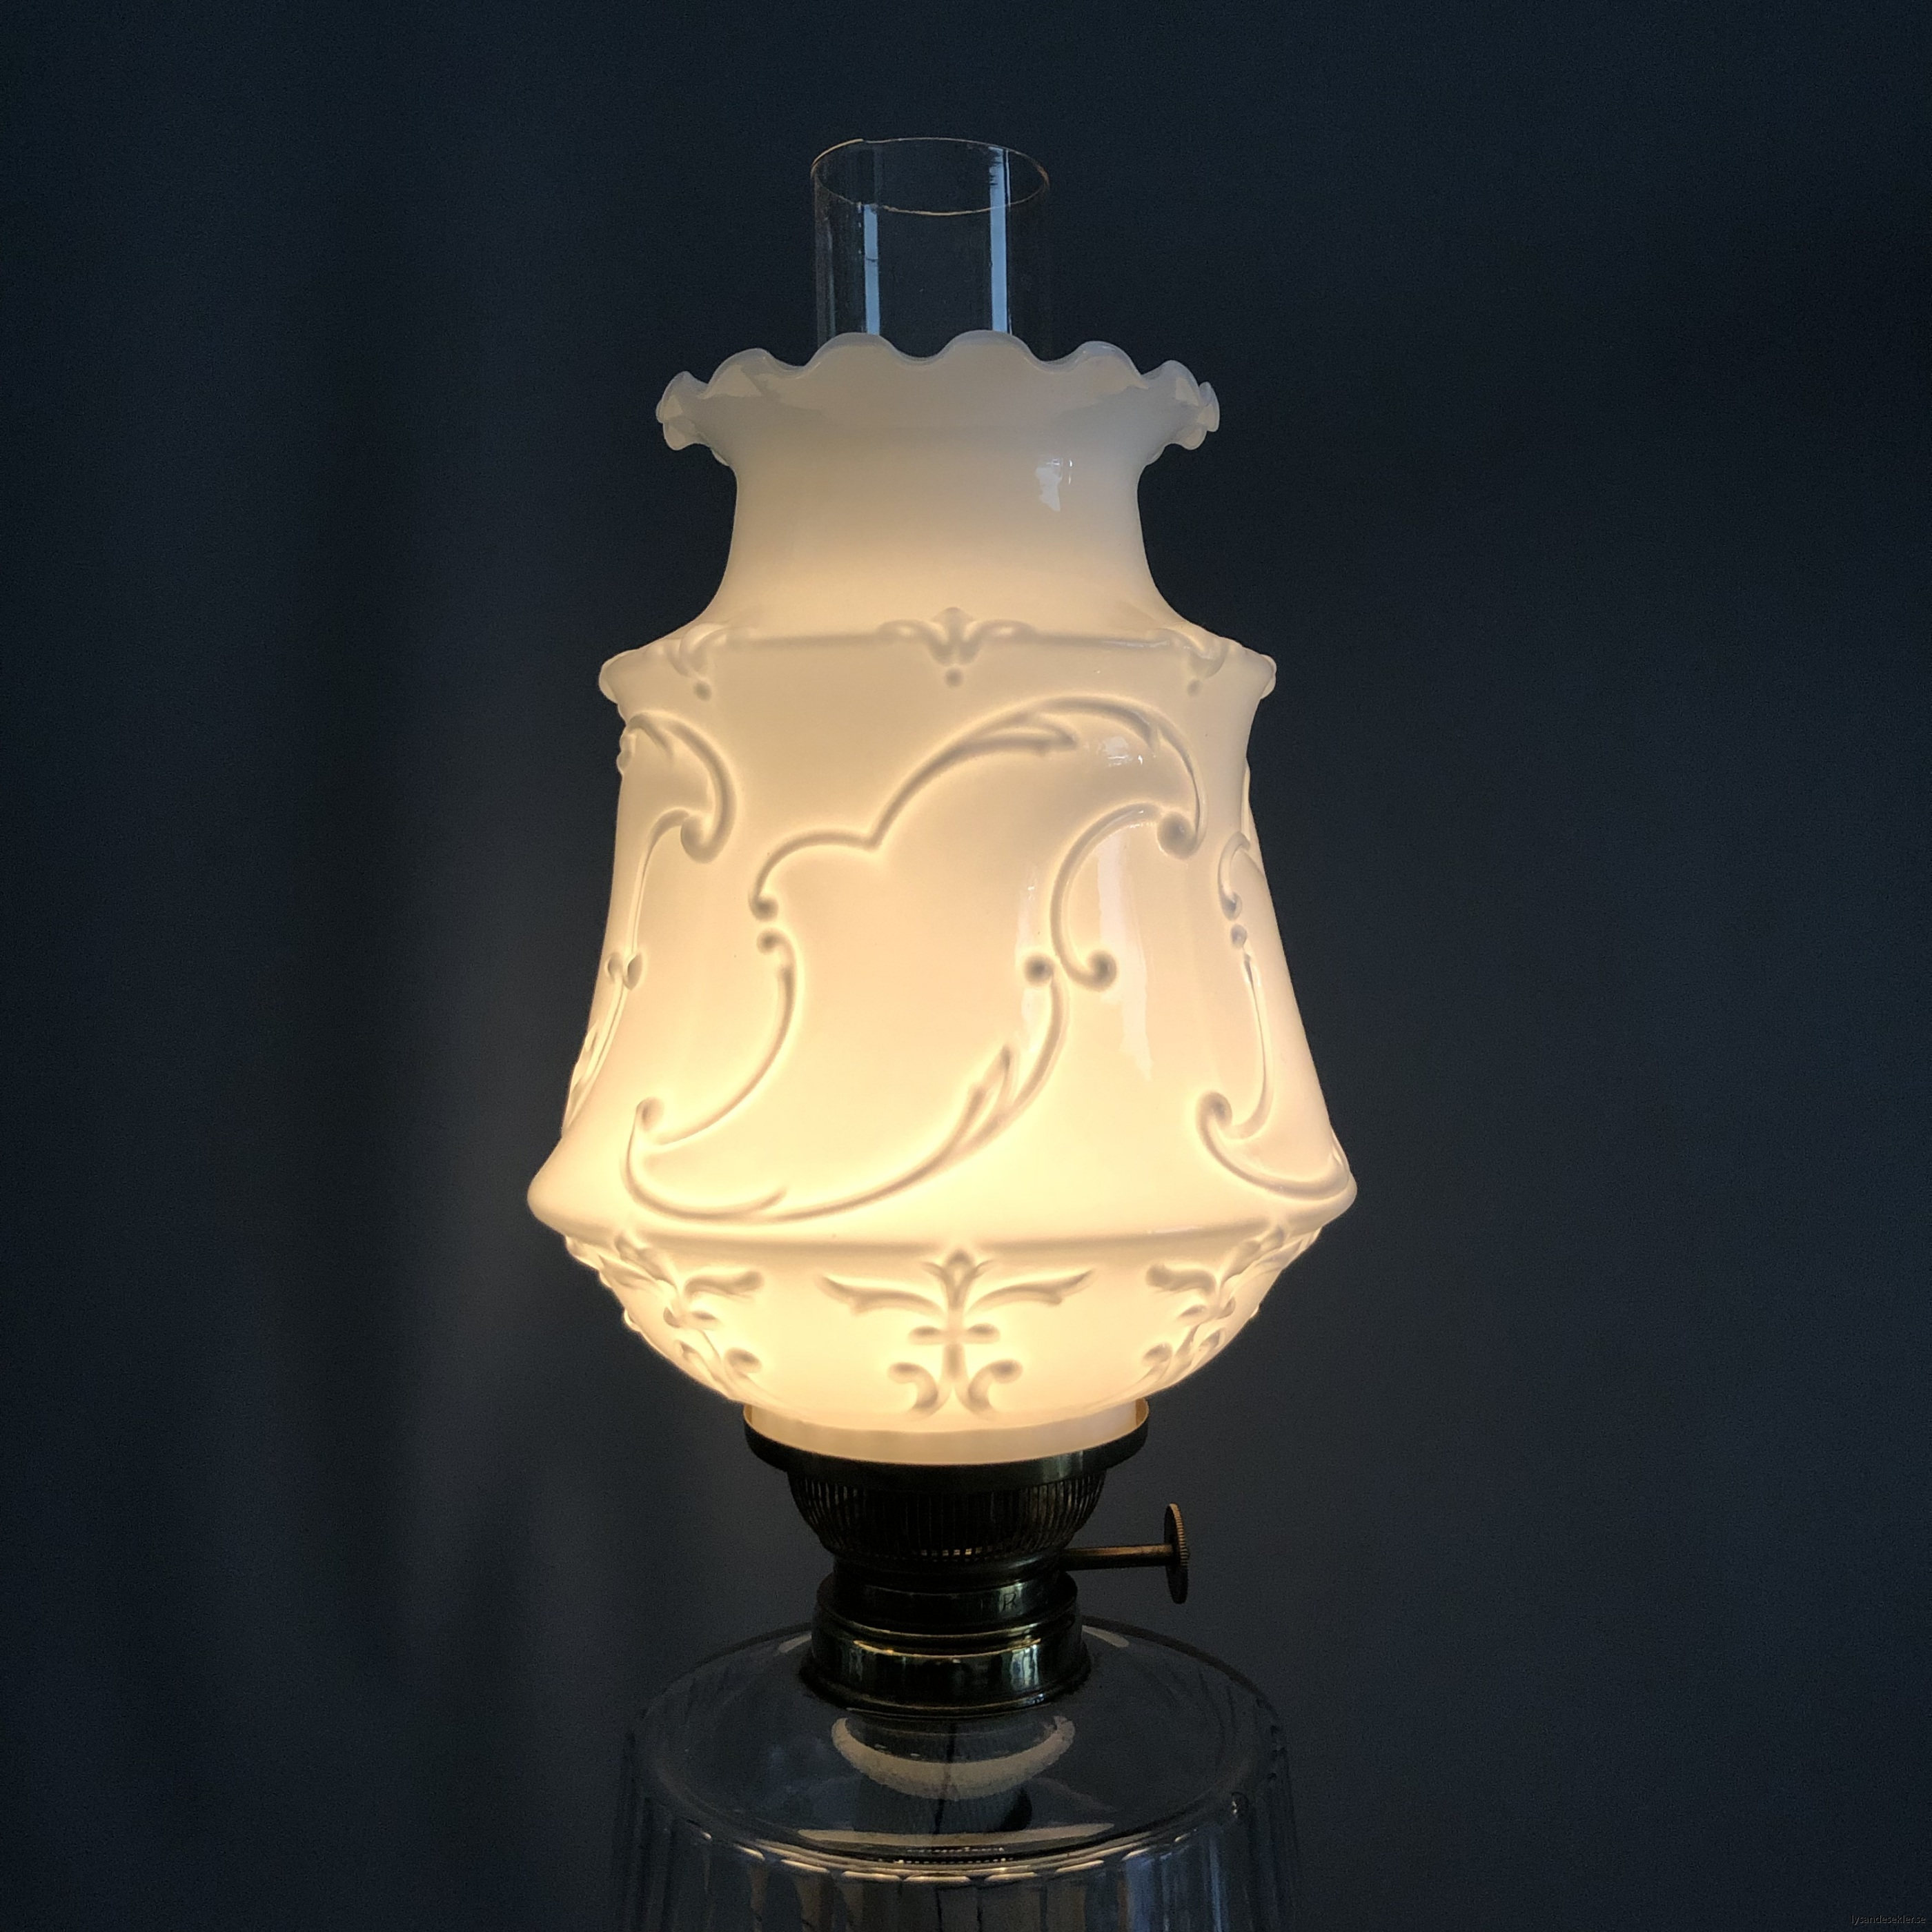 fotogenlampskupa kupa till fotogenlampa tulipan tulpan tulpankupor kupor4